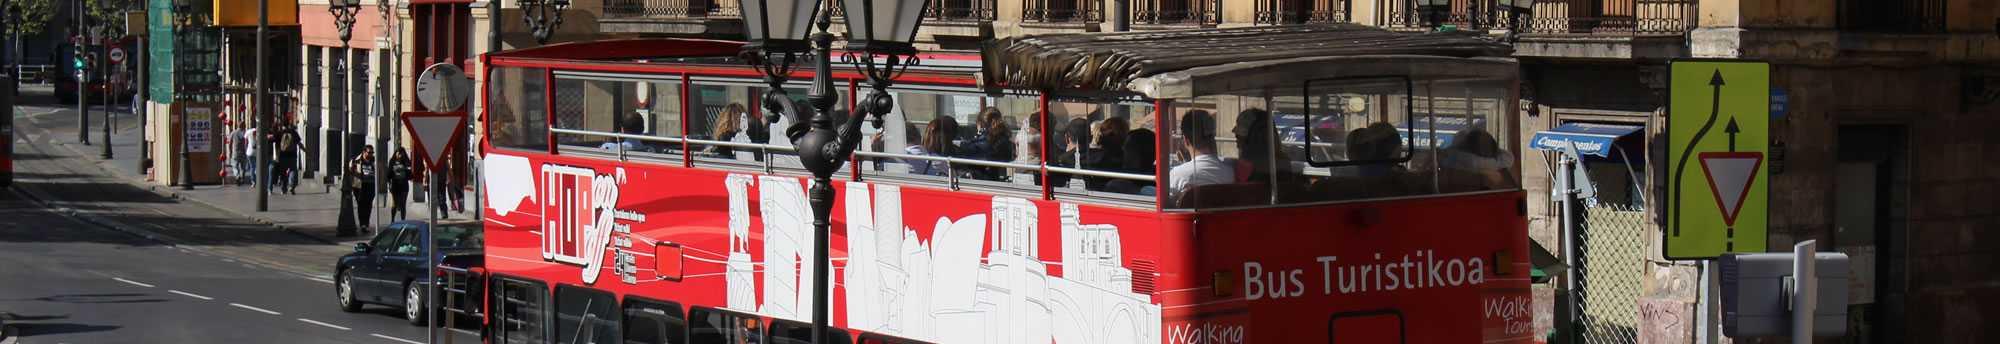 Bus Turístico Bilbao